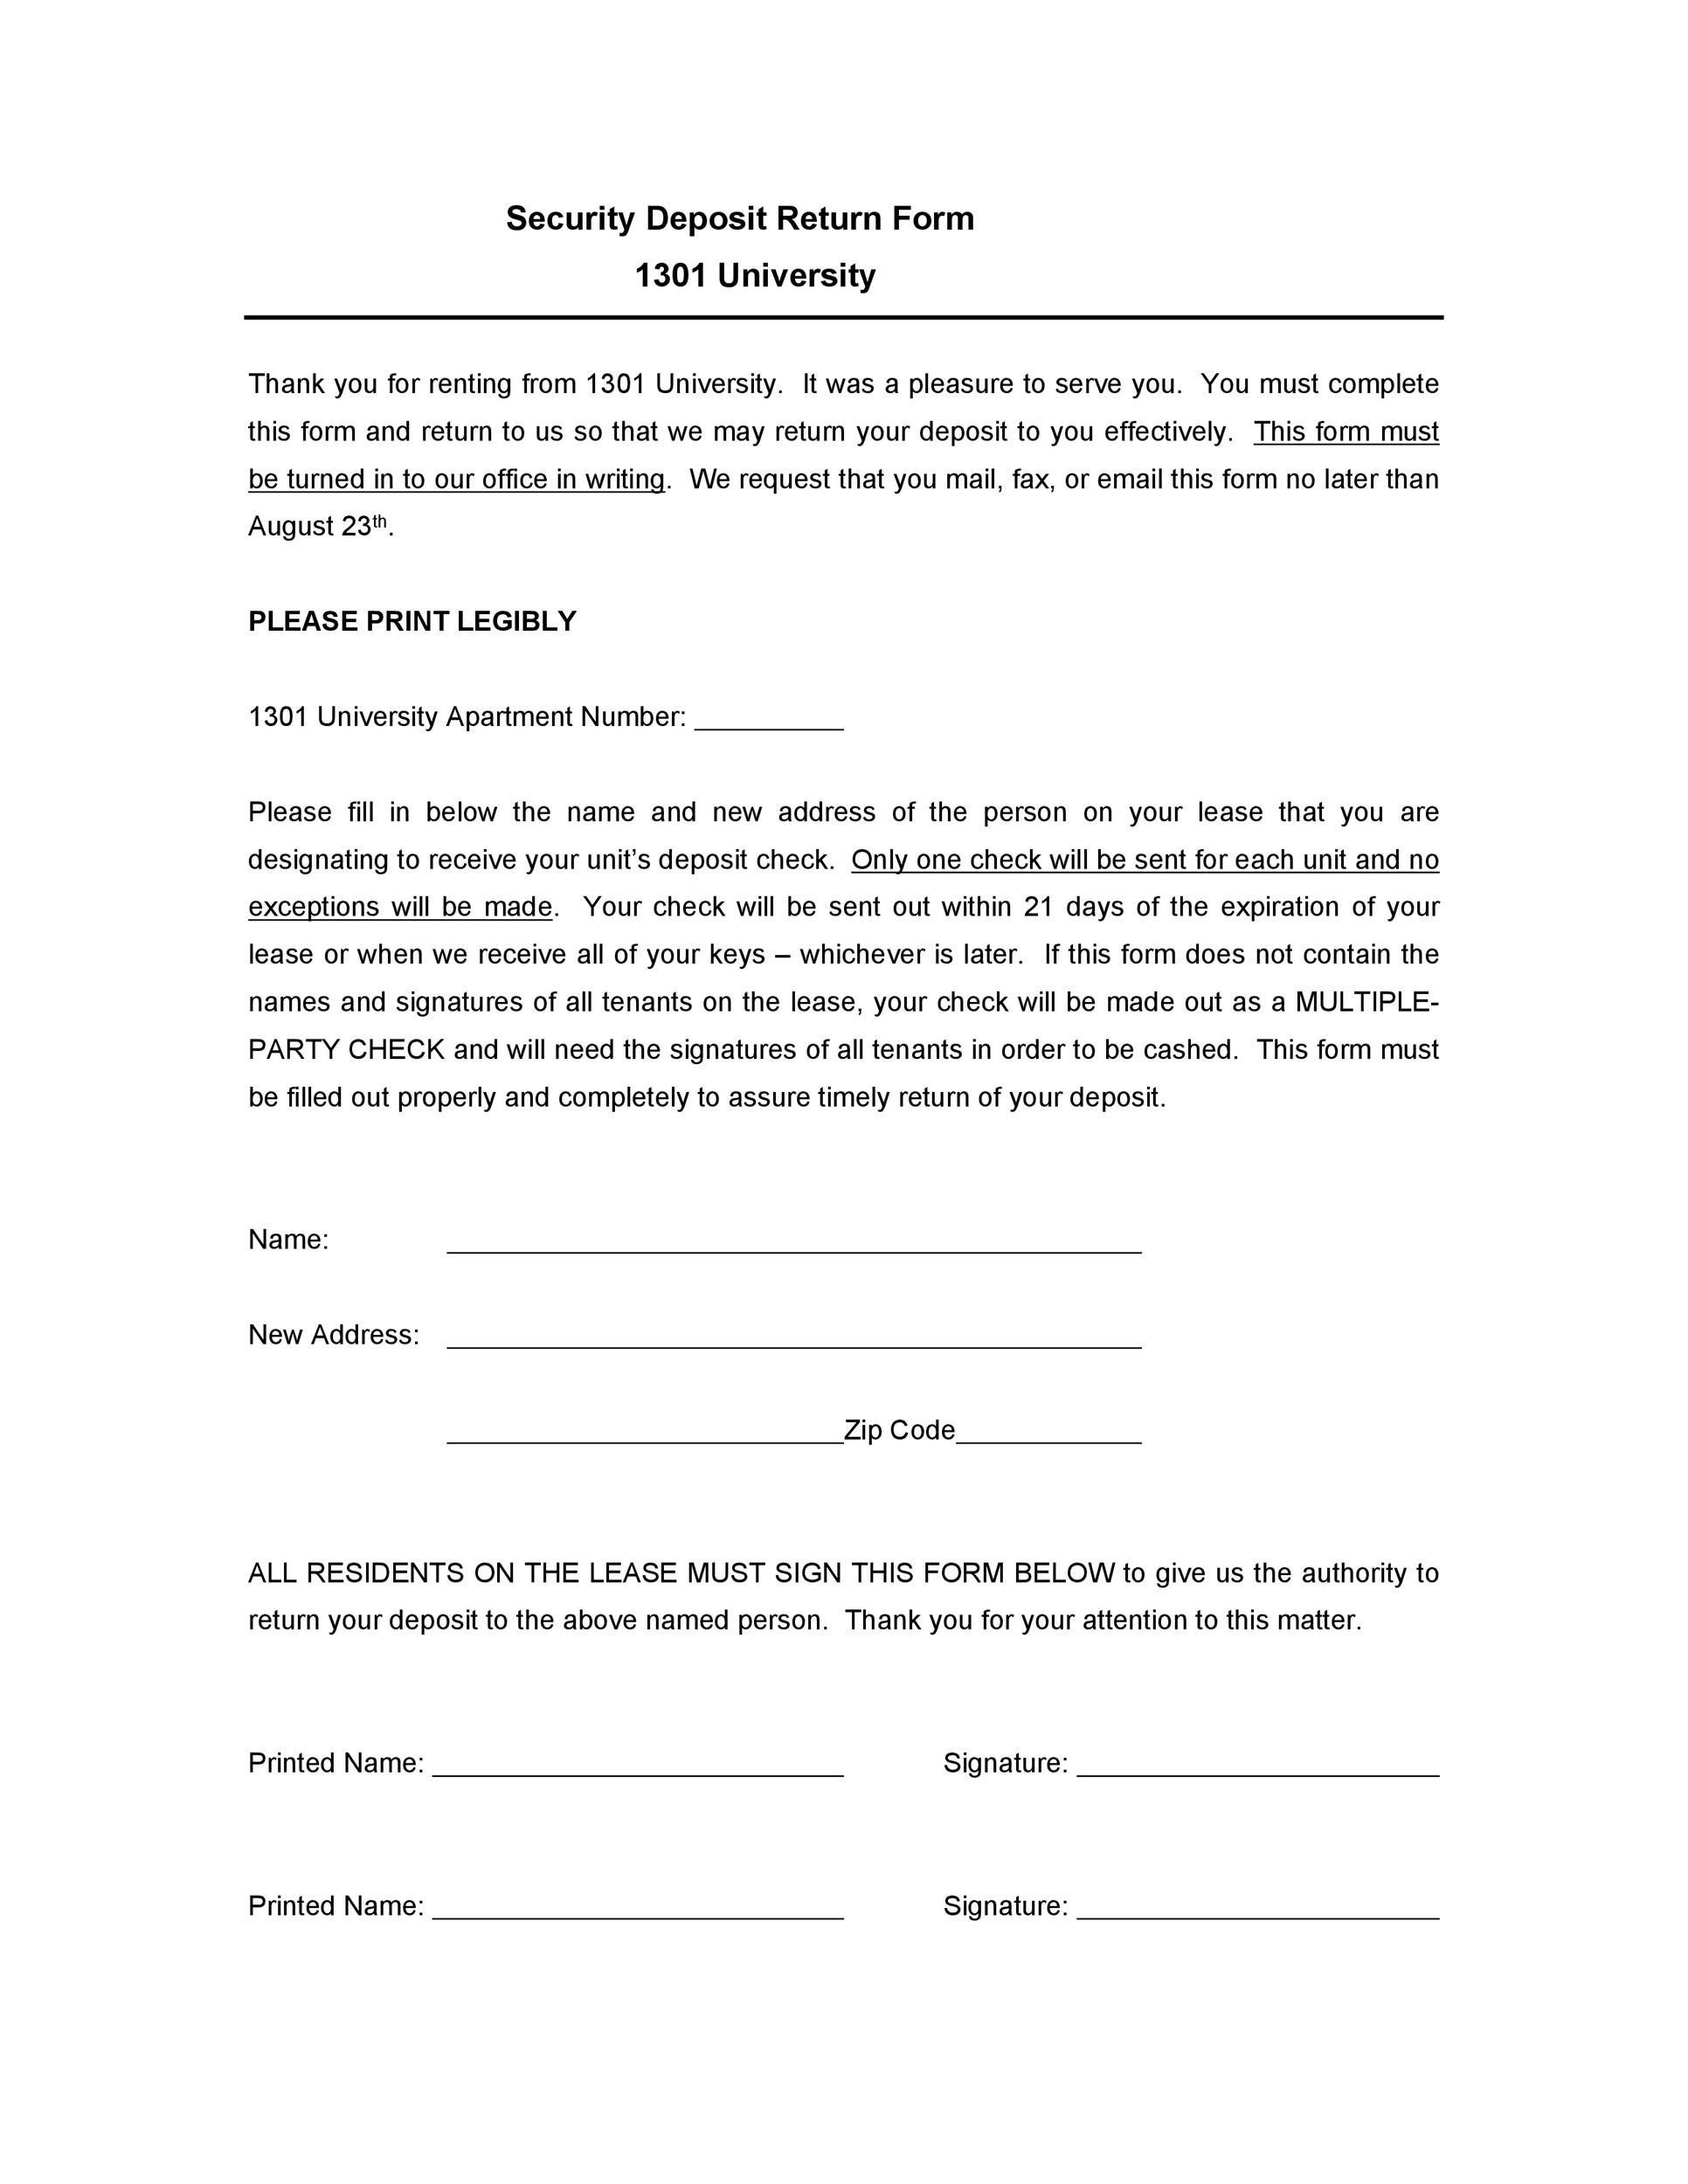 Florida Security Deposit Demand Letter from templatelab.com